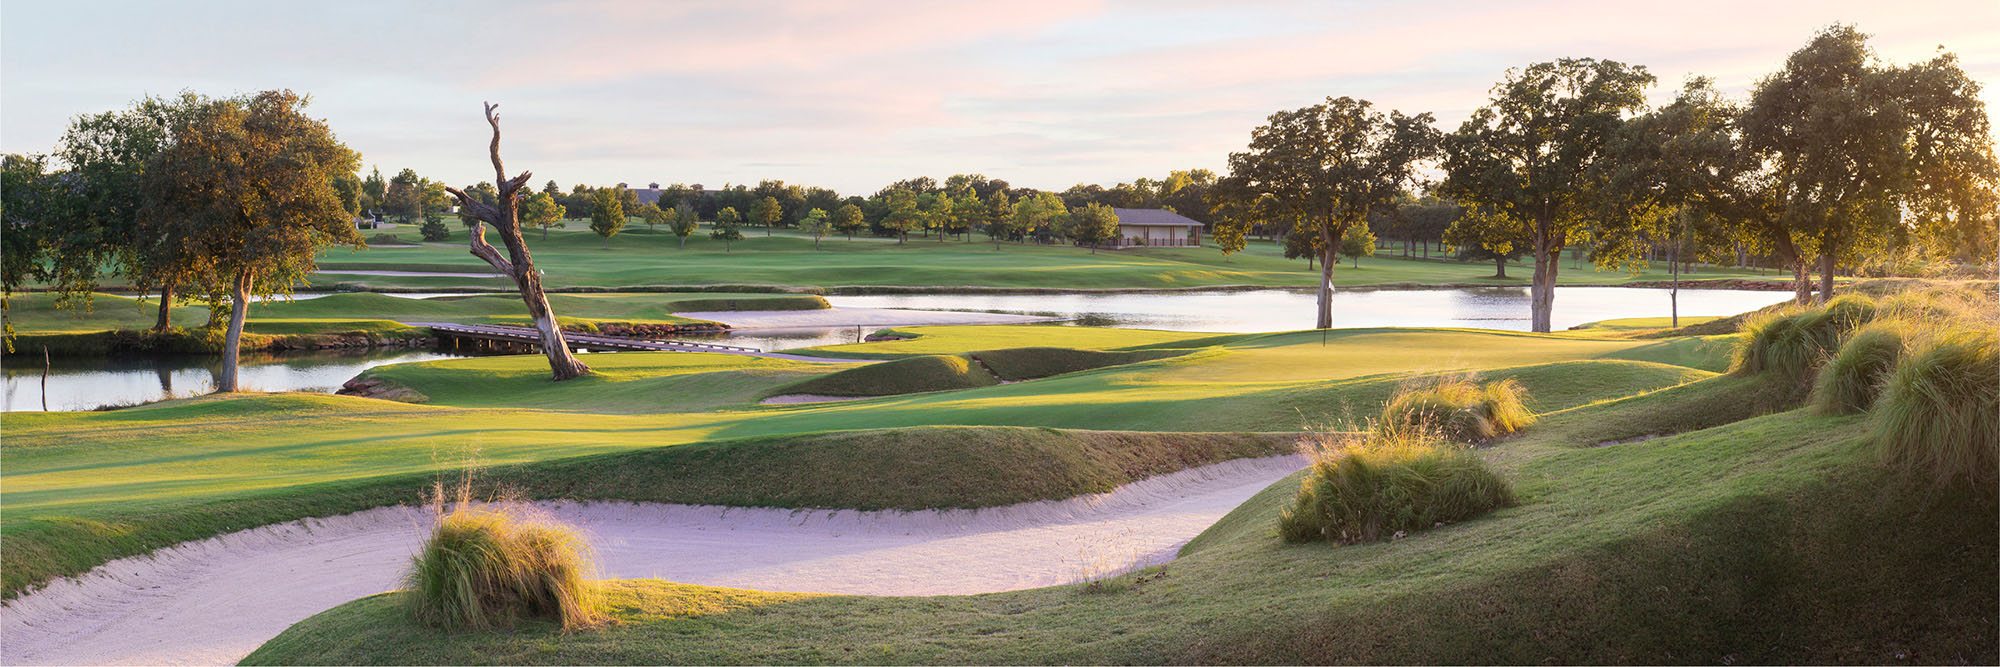 Golf Course Image - Oak Tree National No. 7